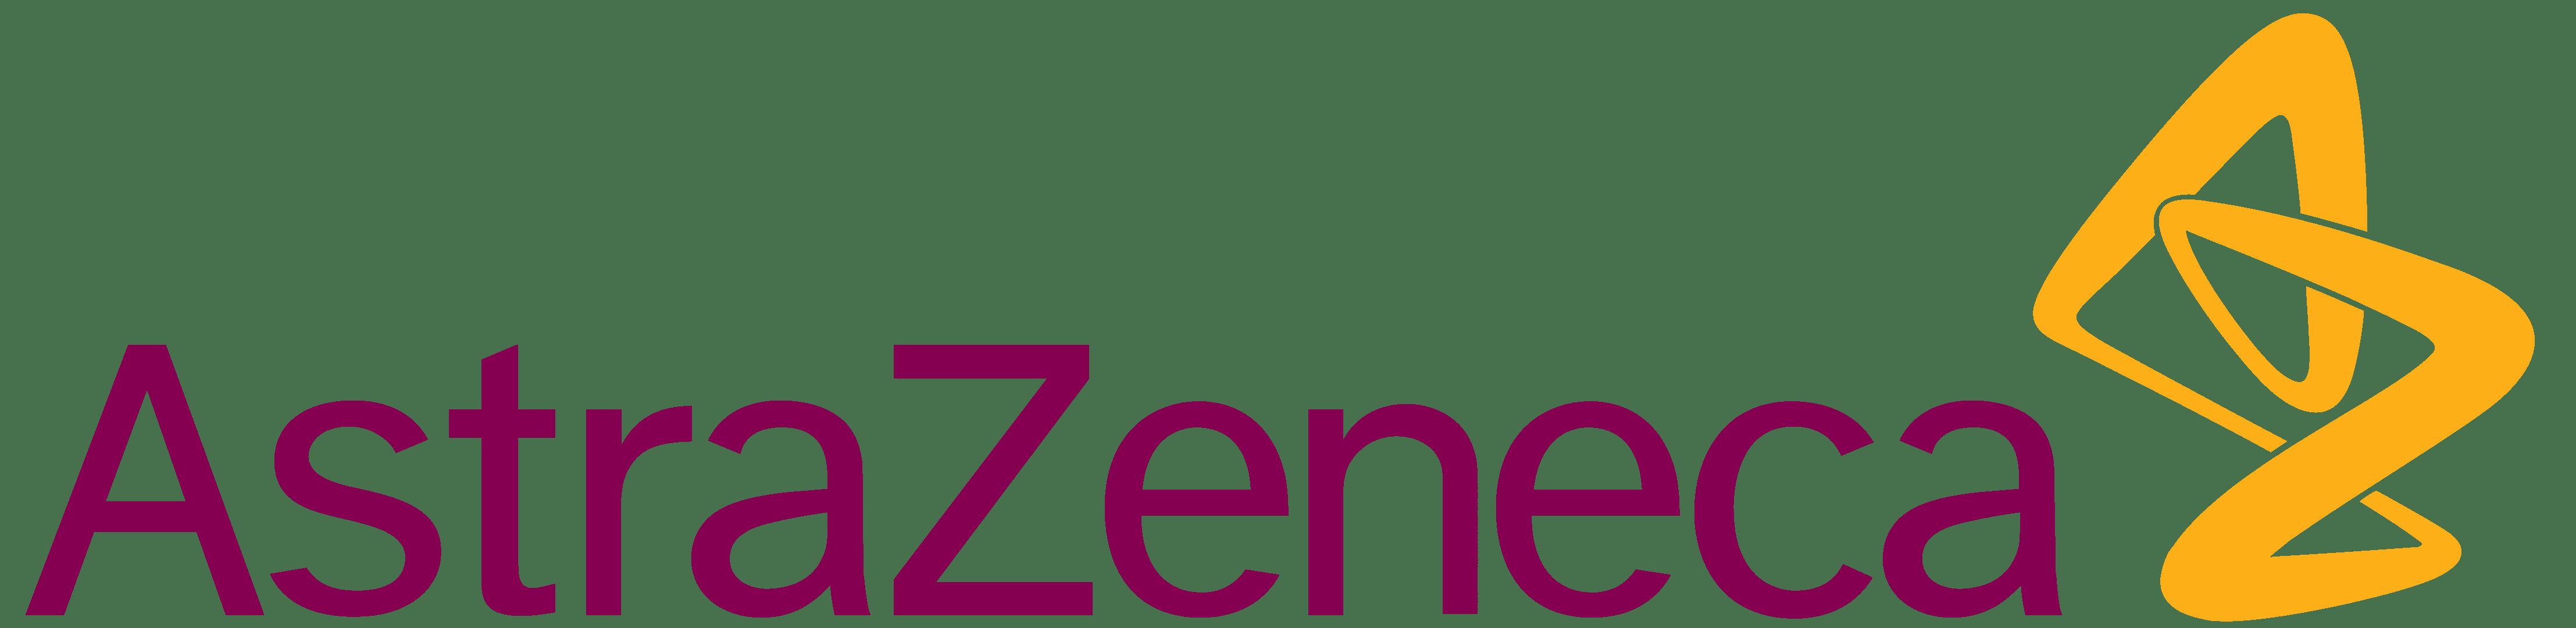 astrazeneca logos download